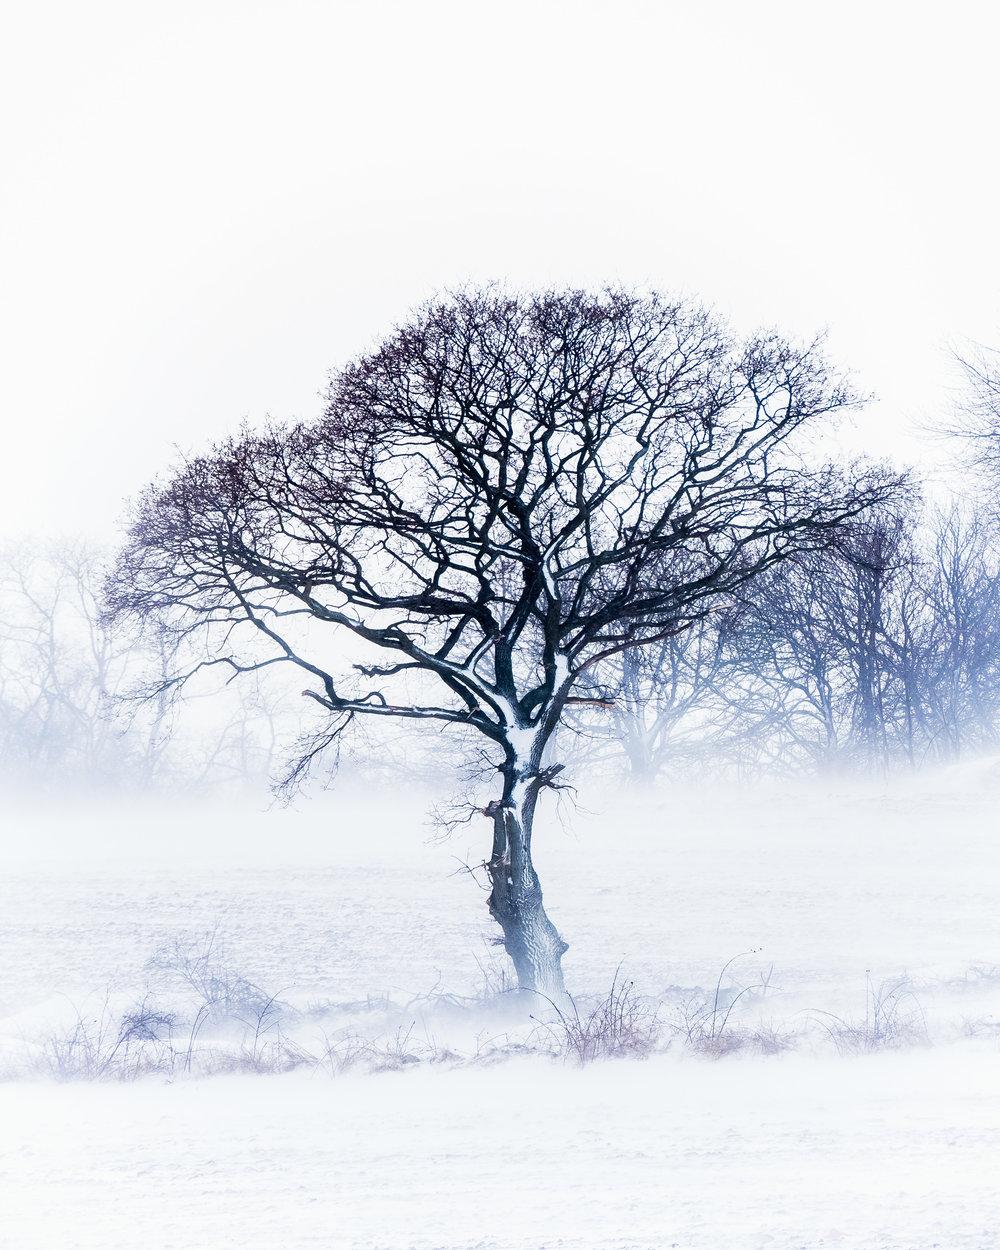 baskemolla tree field snow storm.jpg